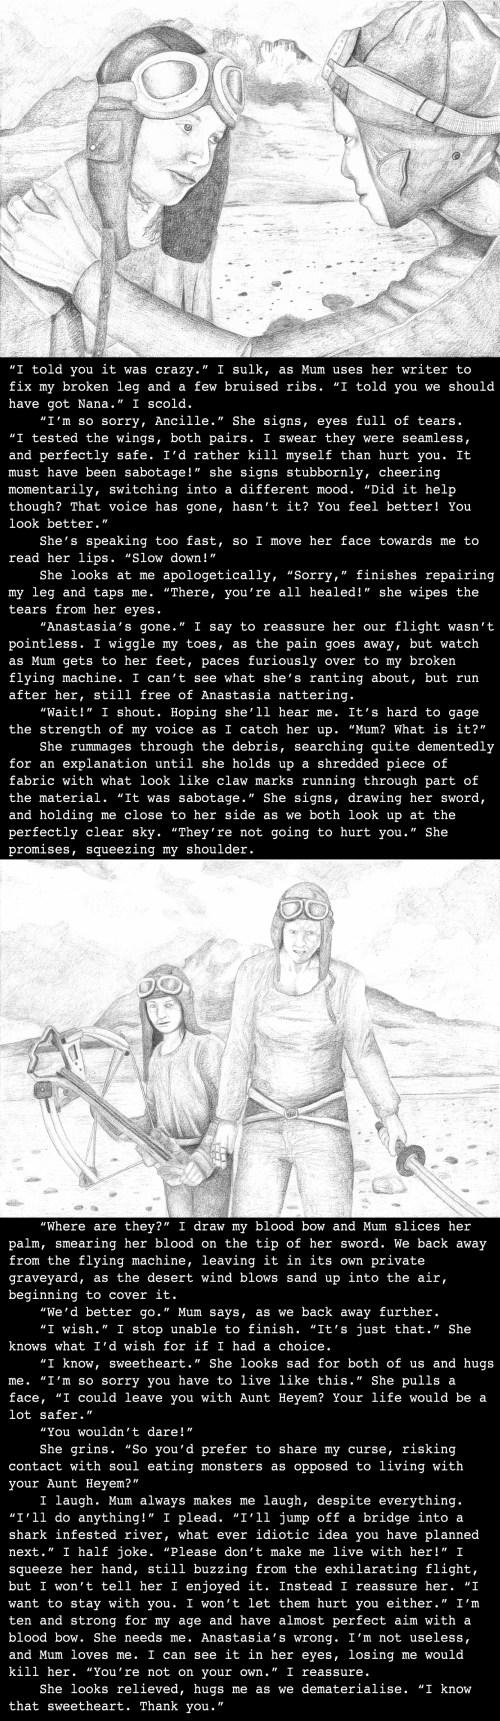 Ancille's back story, set on Mount Kilimanjaro, Tanzania (4010)